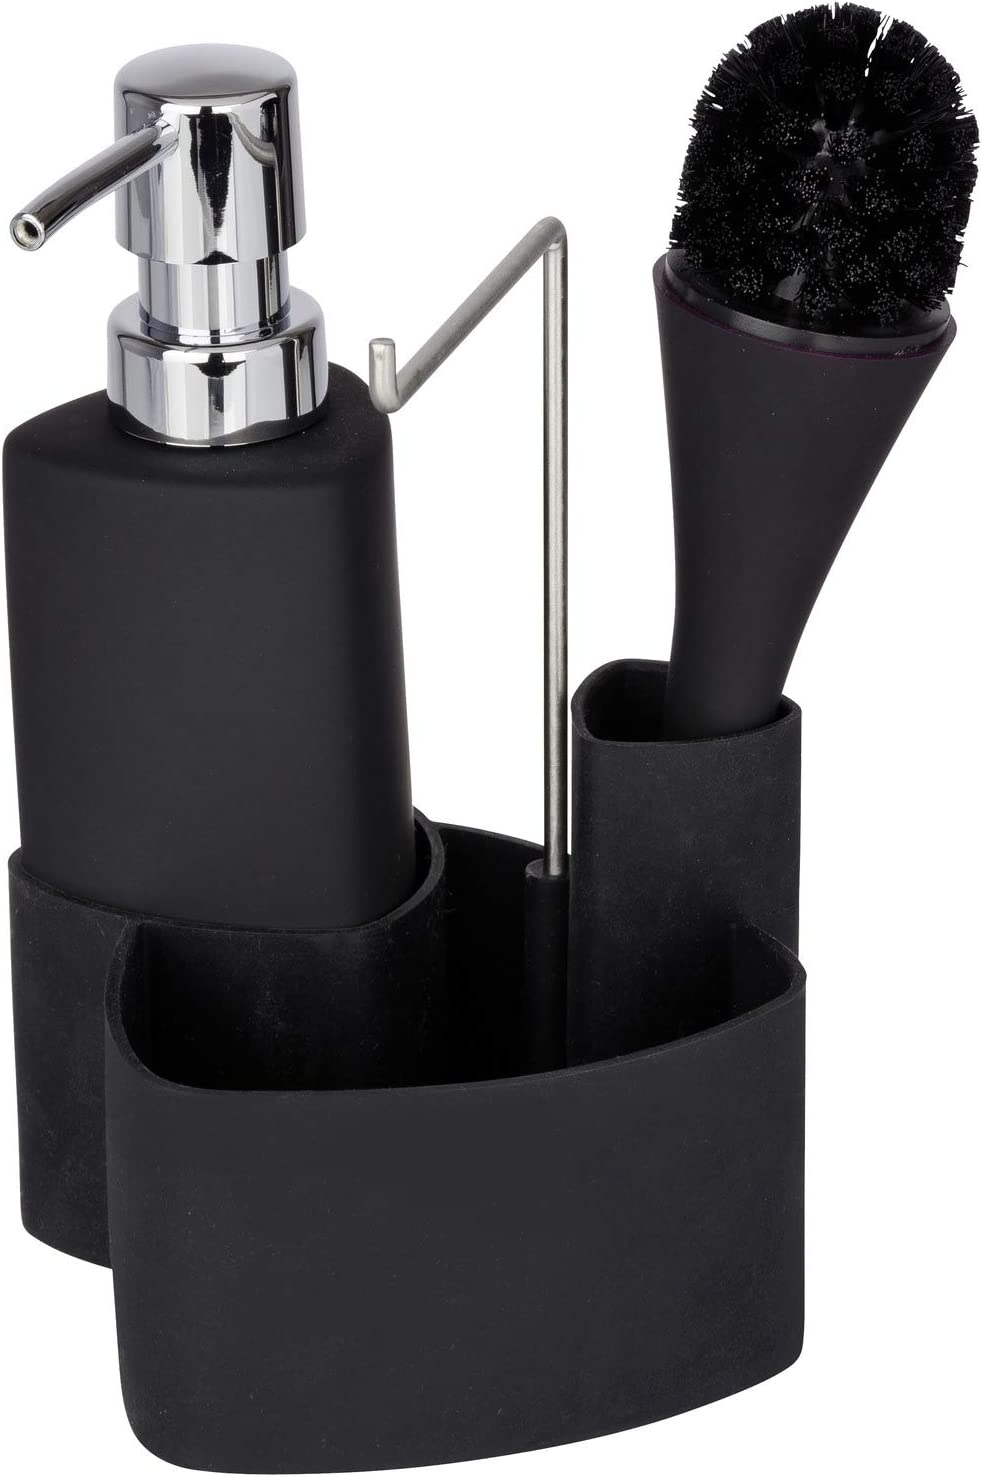 Wenko 3620127100 Conjunto para el Fregadero Empire Negro - con Cepillo, 0.25 L, Cerámica Soft-Touch, 11 x 19 x 12.5 cm, Negro